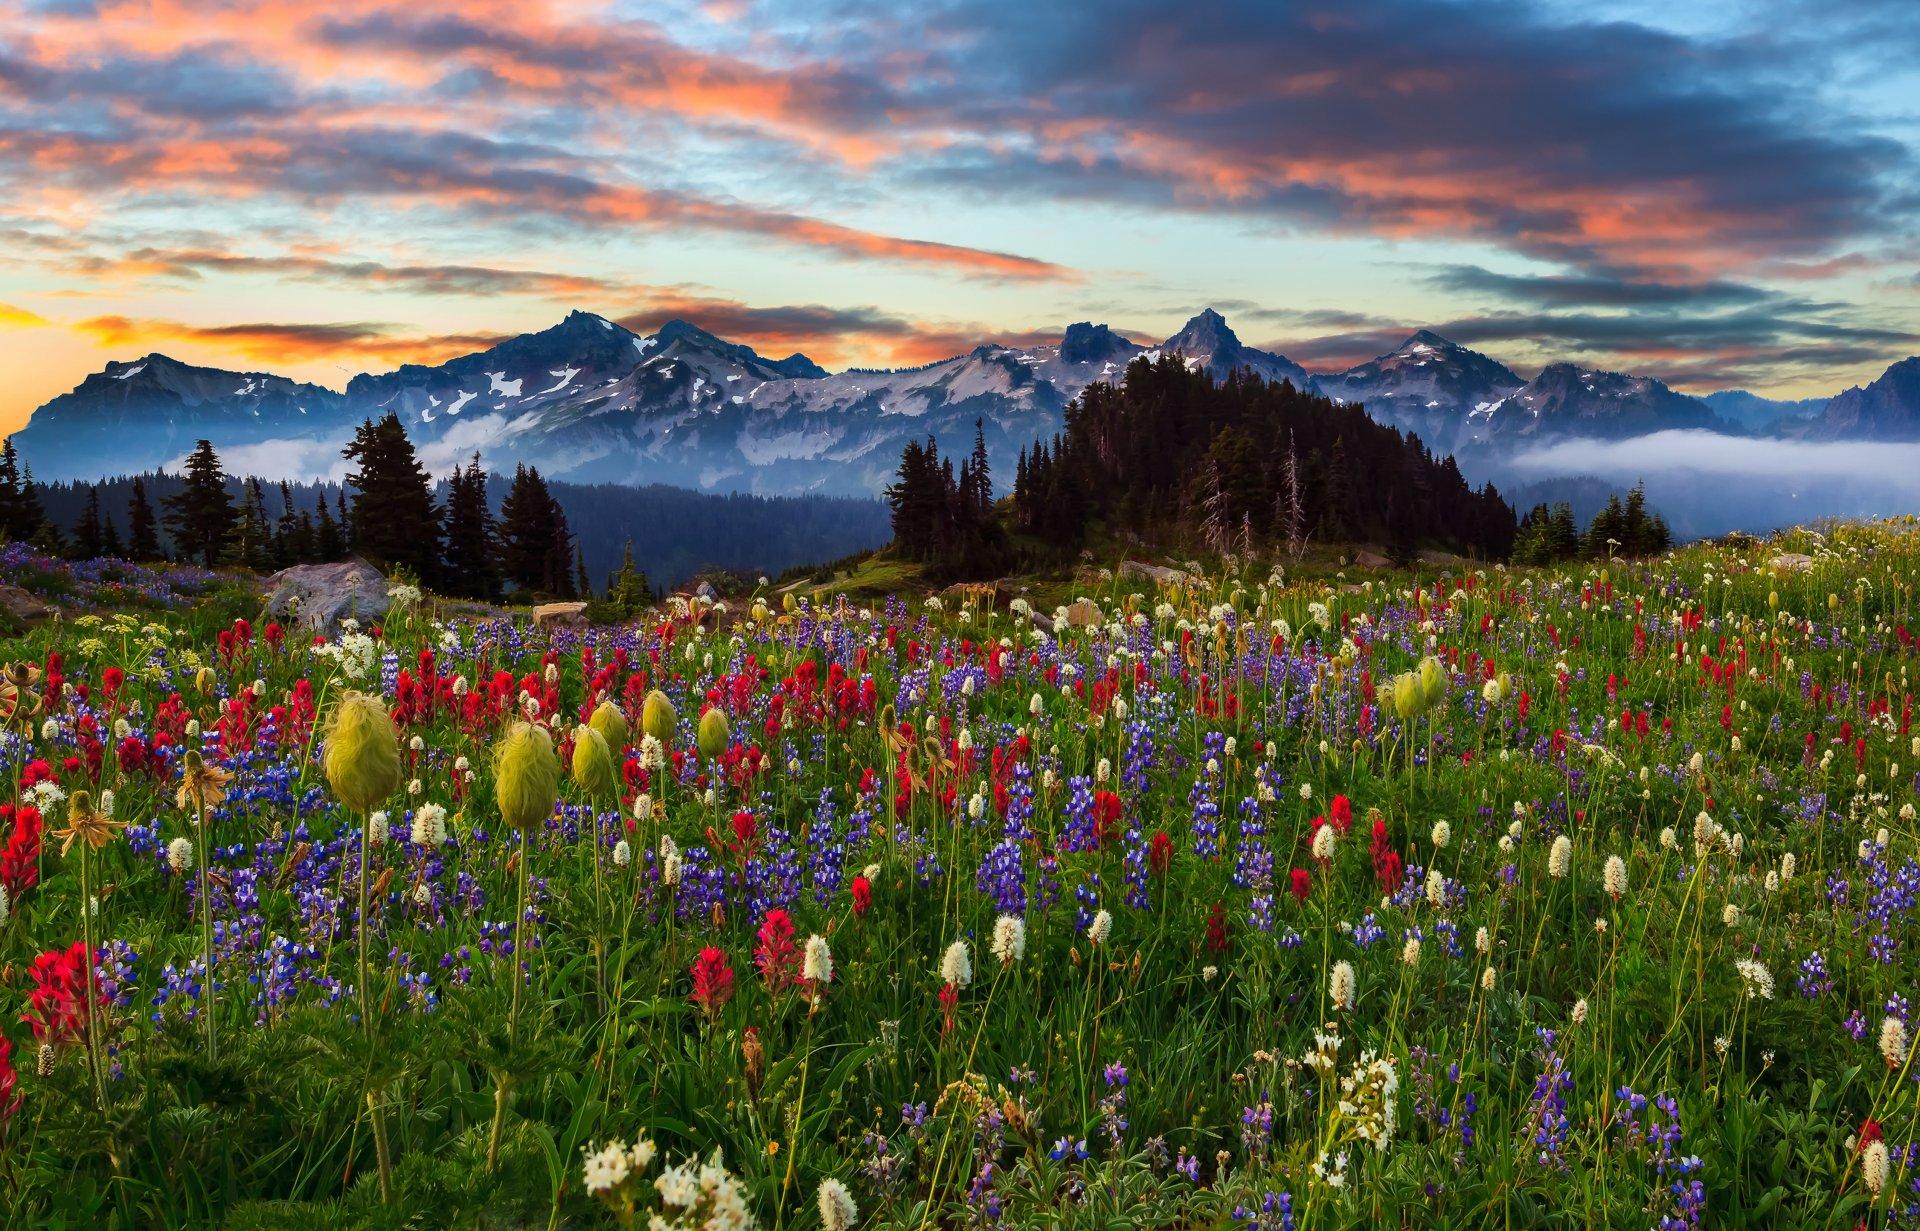 пейзаж картинки с цветами меня даче